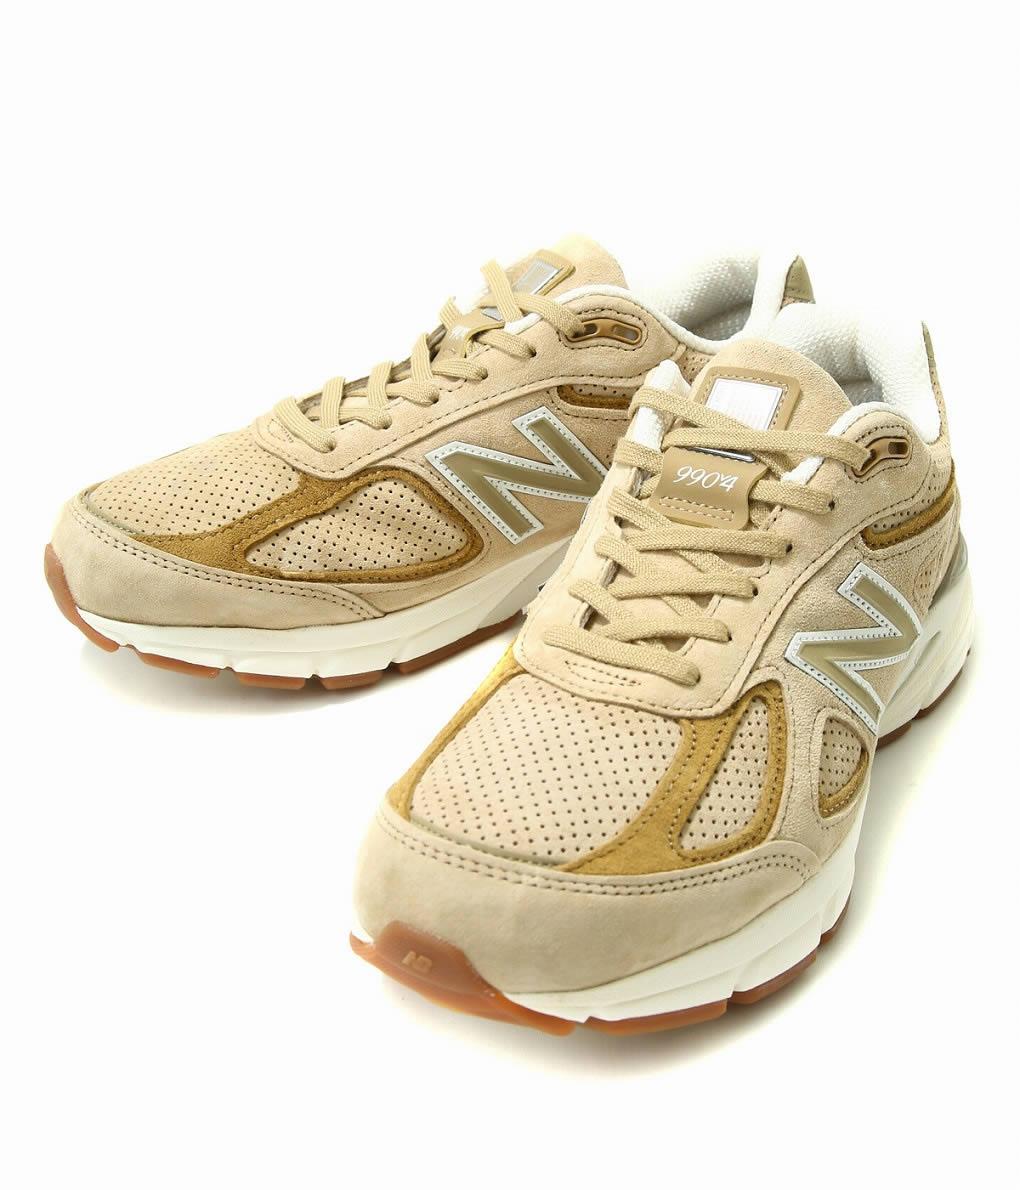 New Balance / ニューバランス : M990 D HL4 : メンズ スニーカー シューズ 靴 : M990-D-HL4 【NOA】